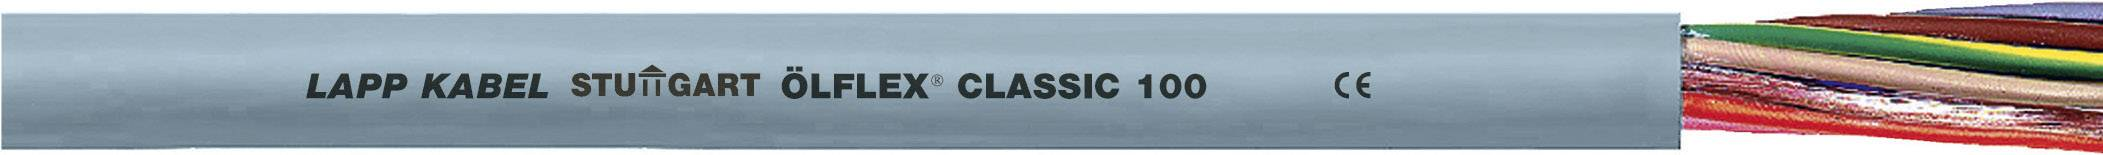 Kabel LappKabel Ölflex CLASSIC 100 40G0,75 (0010036), PVC, 17,3 mm, 500 V, šedá, 500 m